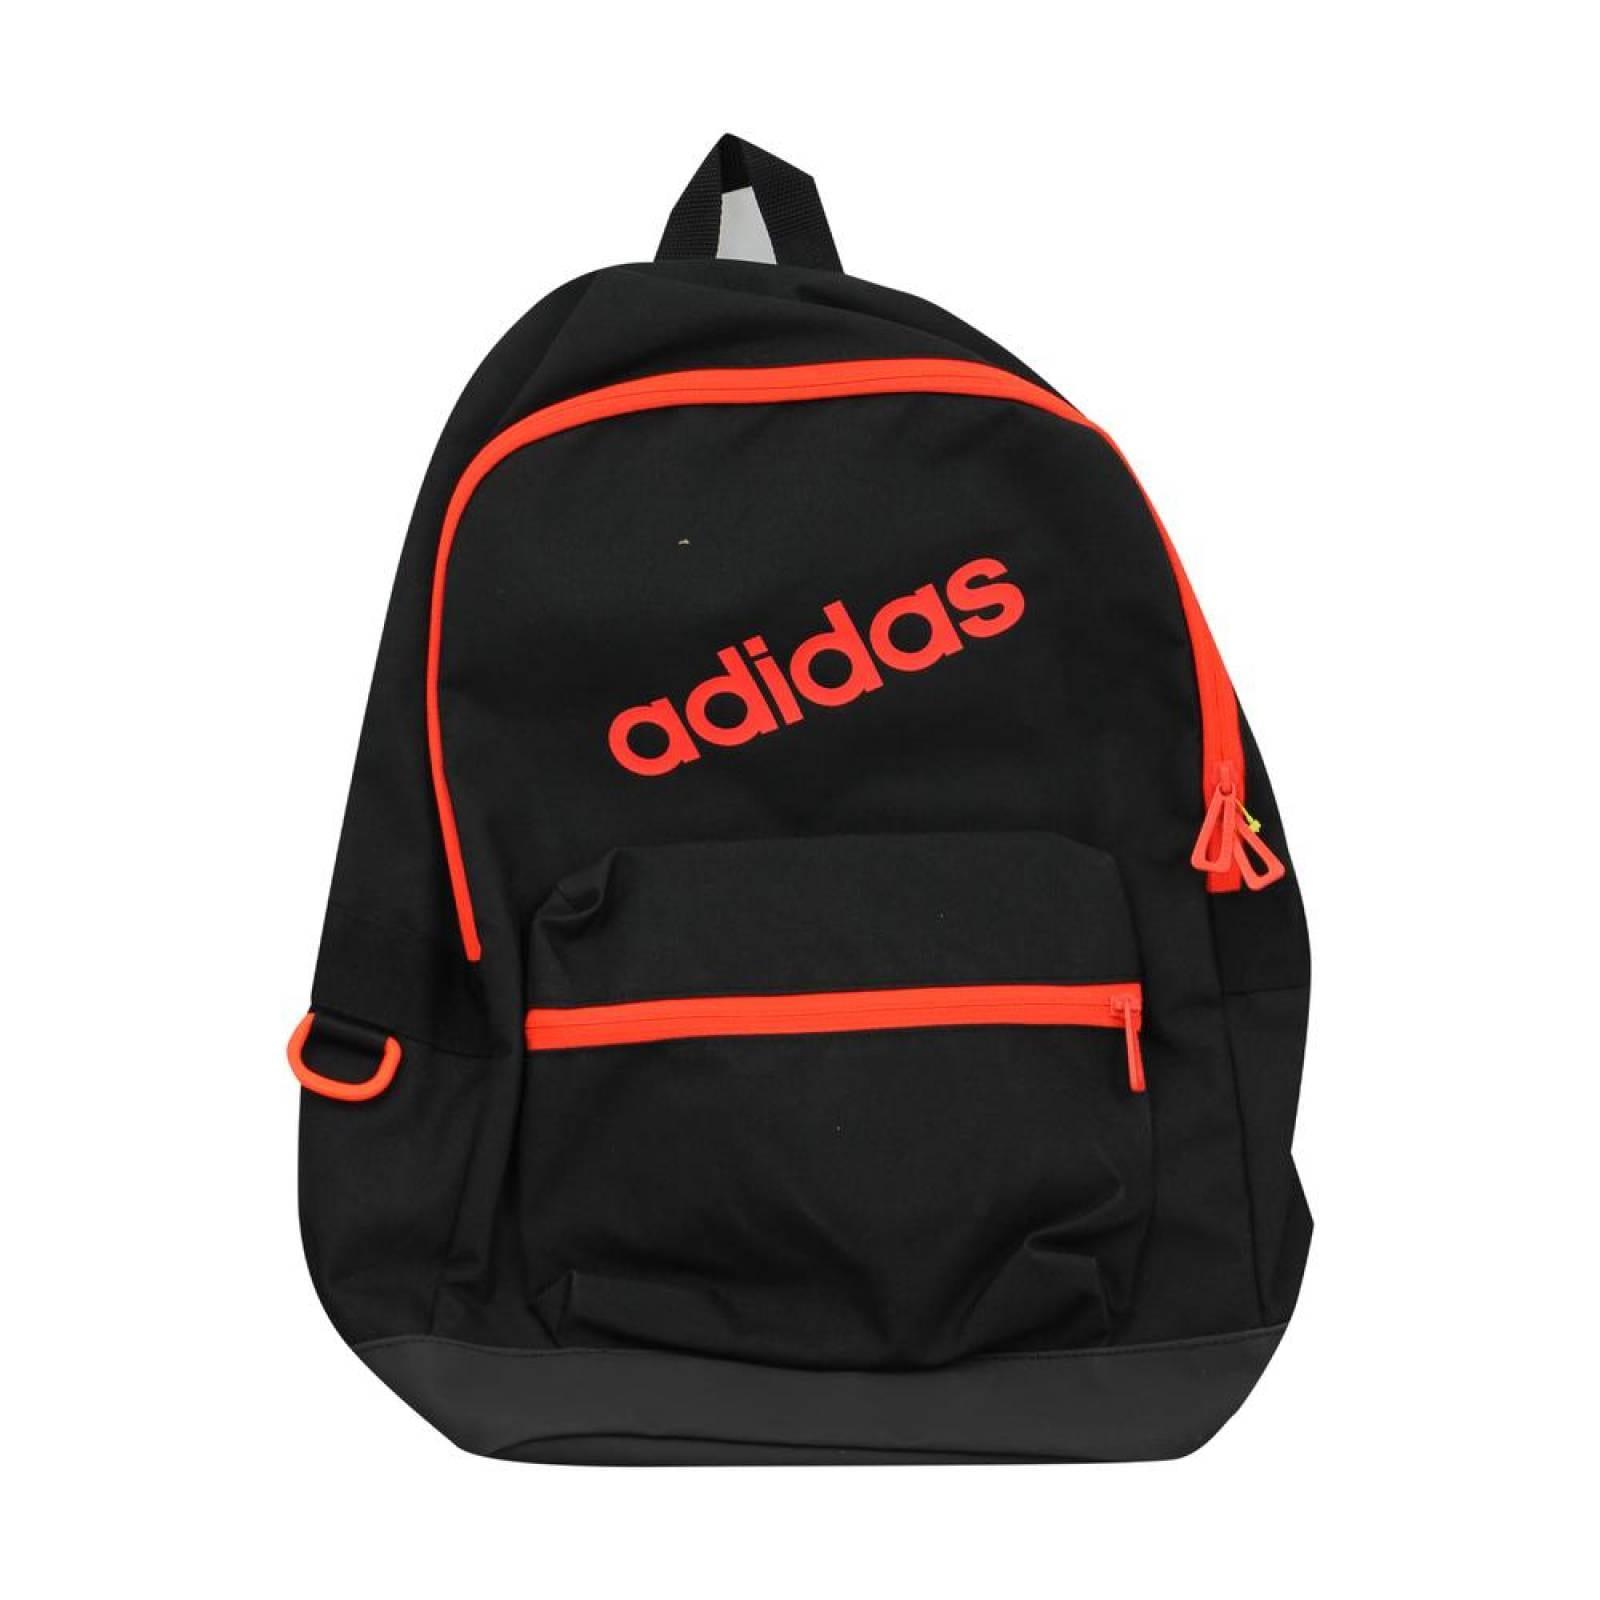 Mochila Adidas Daily CD9913 Negro Gorra Dad Cap De Regalo